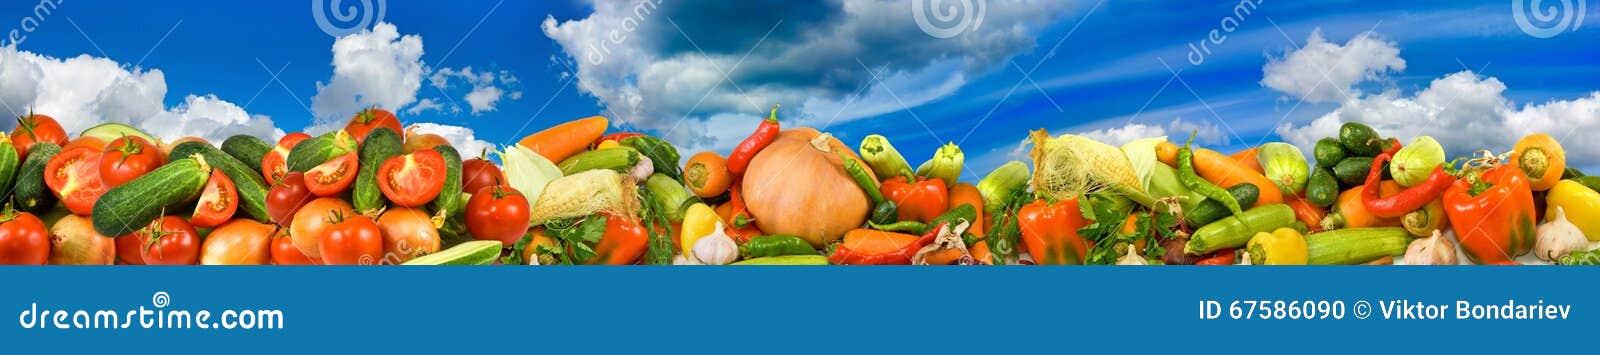 Bild av många rå grönsaker en himmelbakgrund